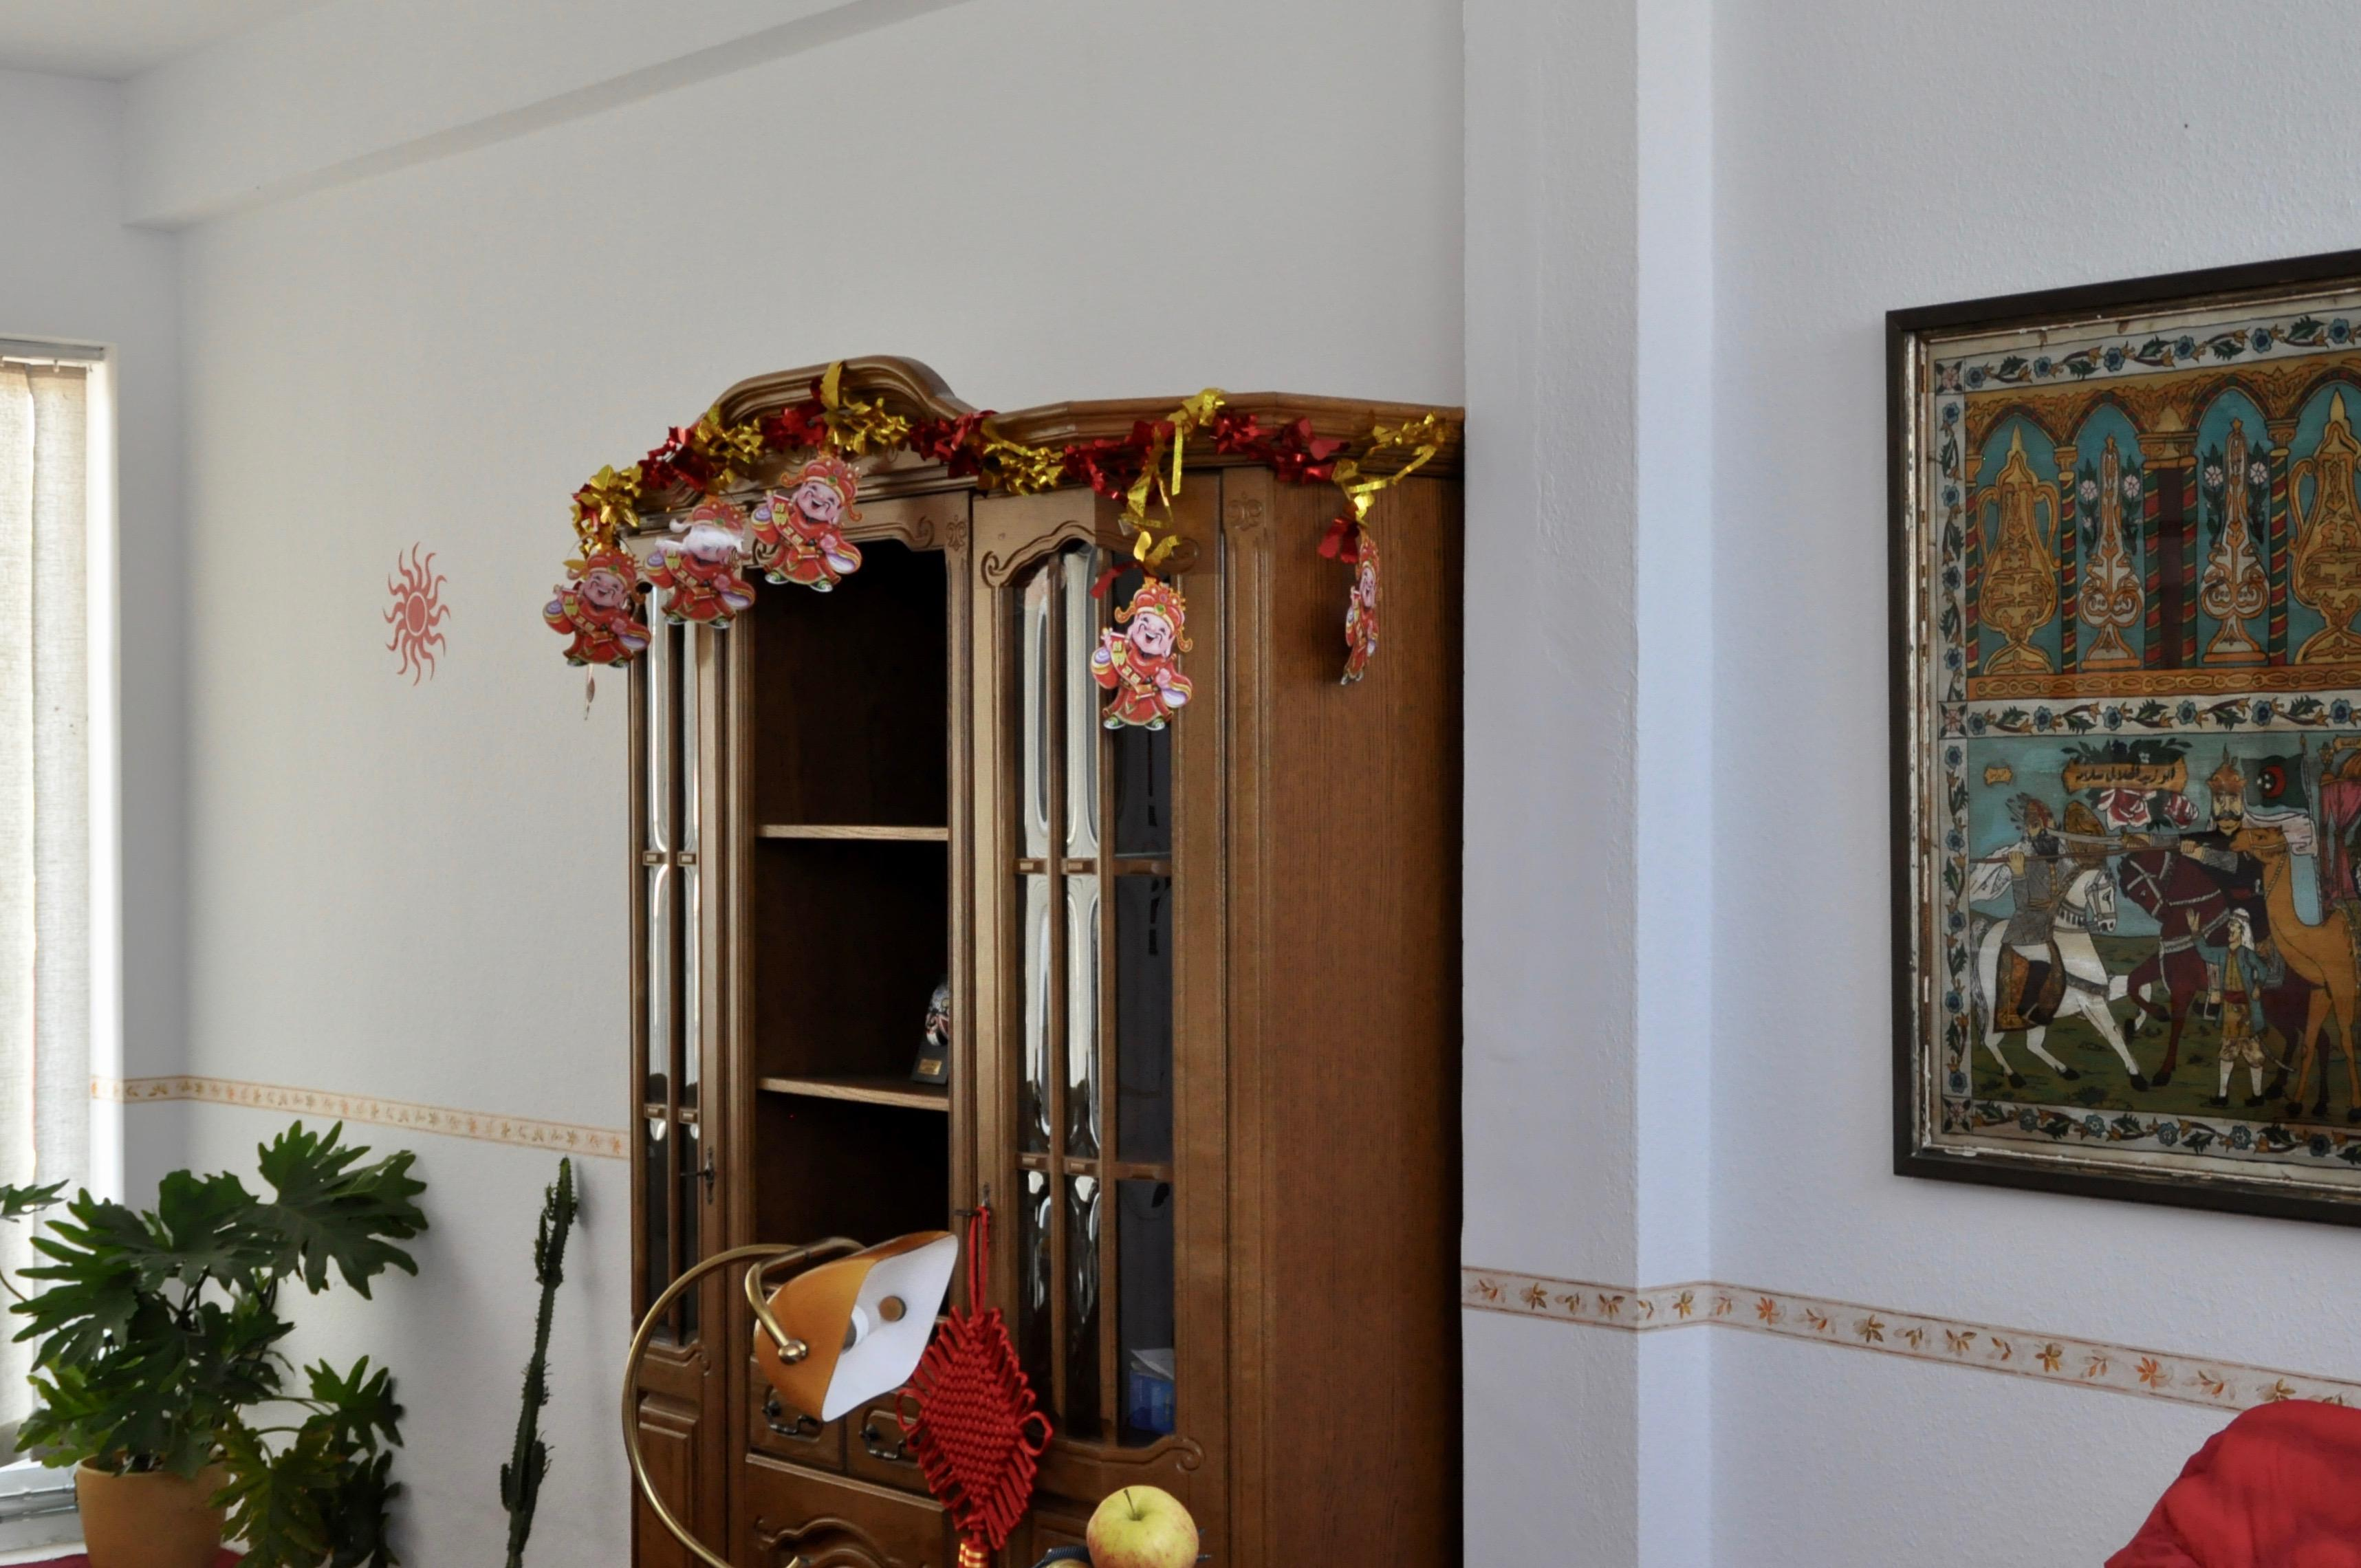 Chinesische Massage - Wellness Centrum Hui-Hui Bergisch Gladbach